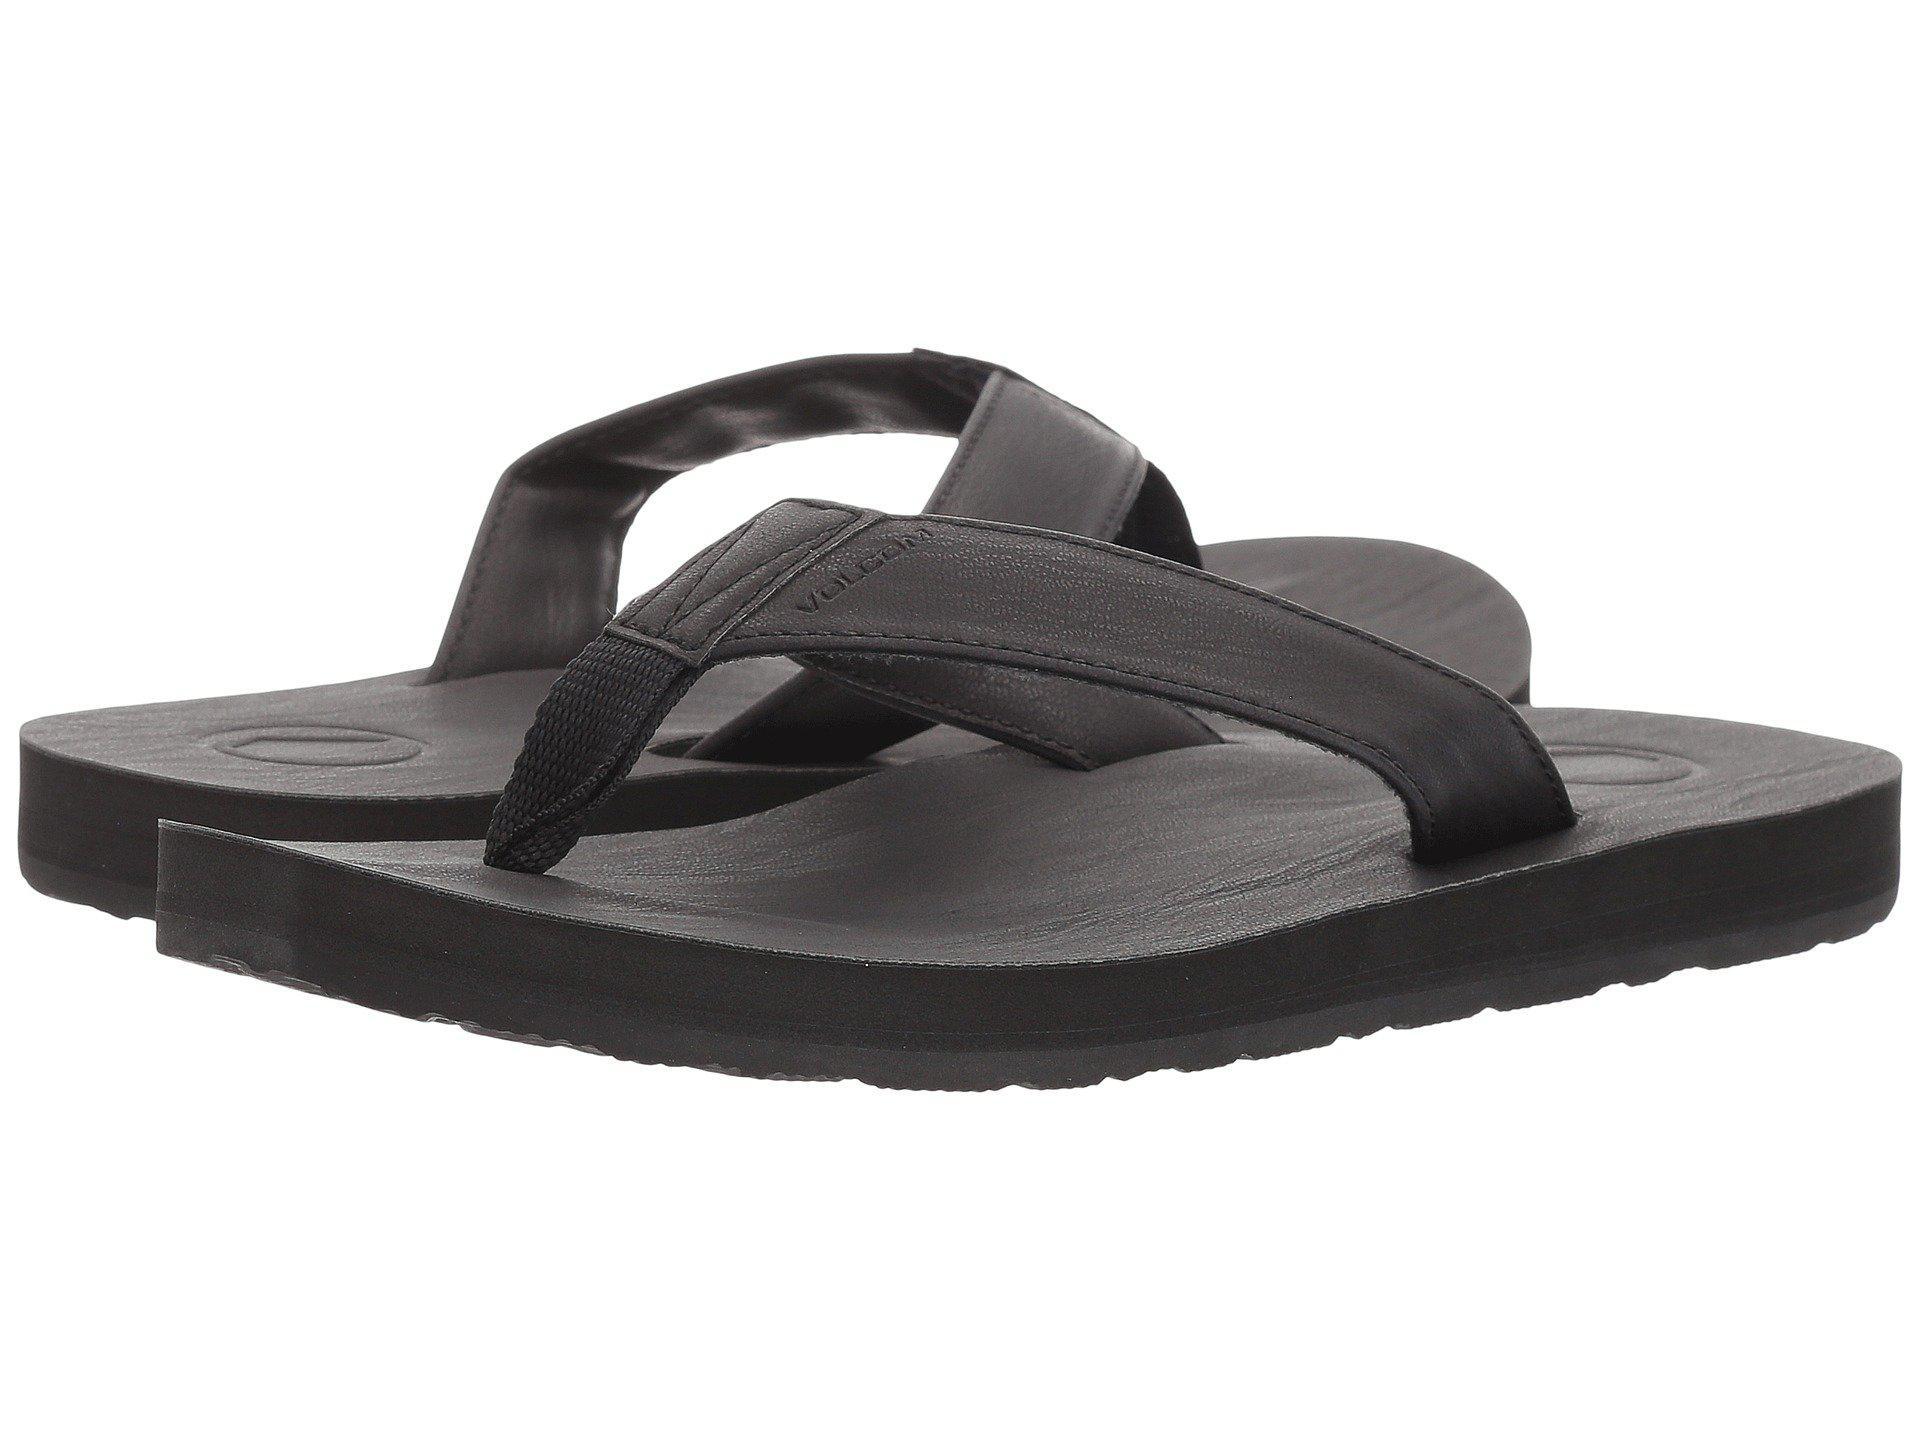 708cb998758c2 Lyst - Volcom Fathom Sandal (black) Men s Shoes in Black for Men